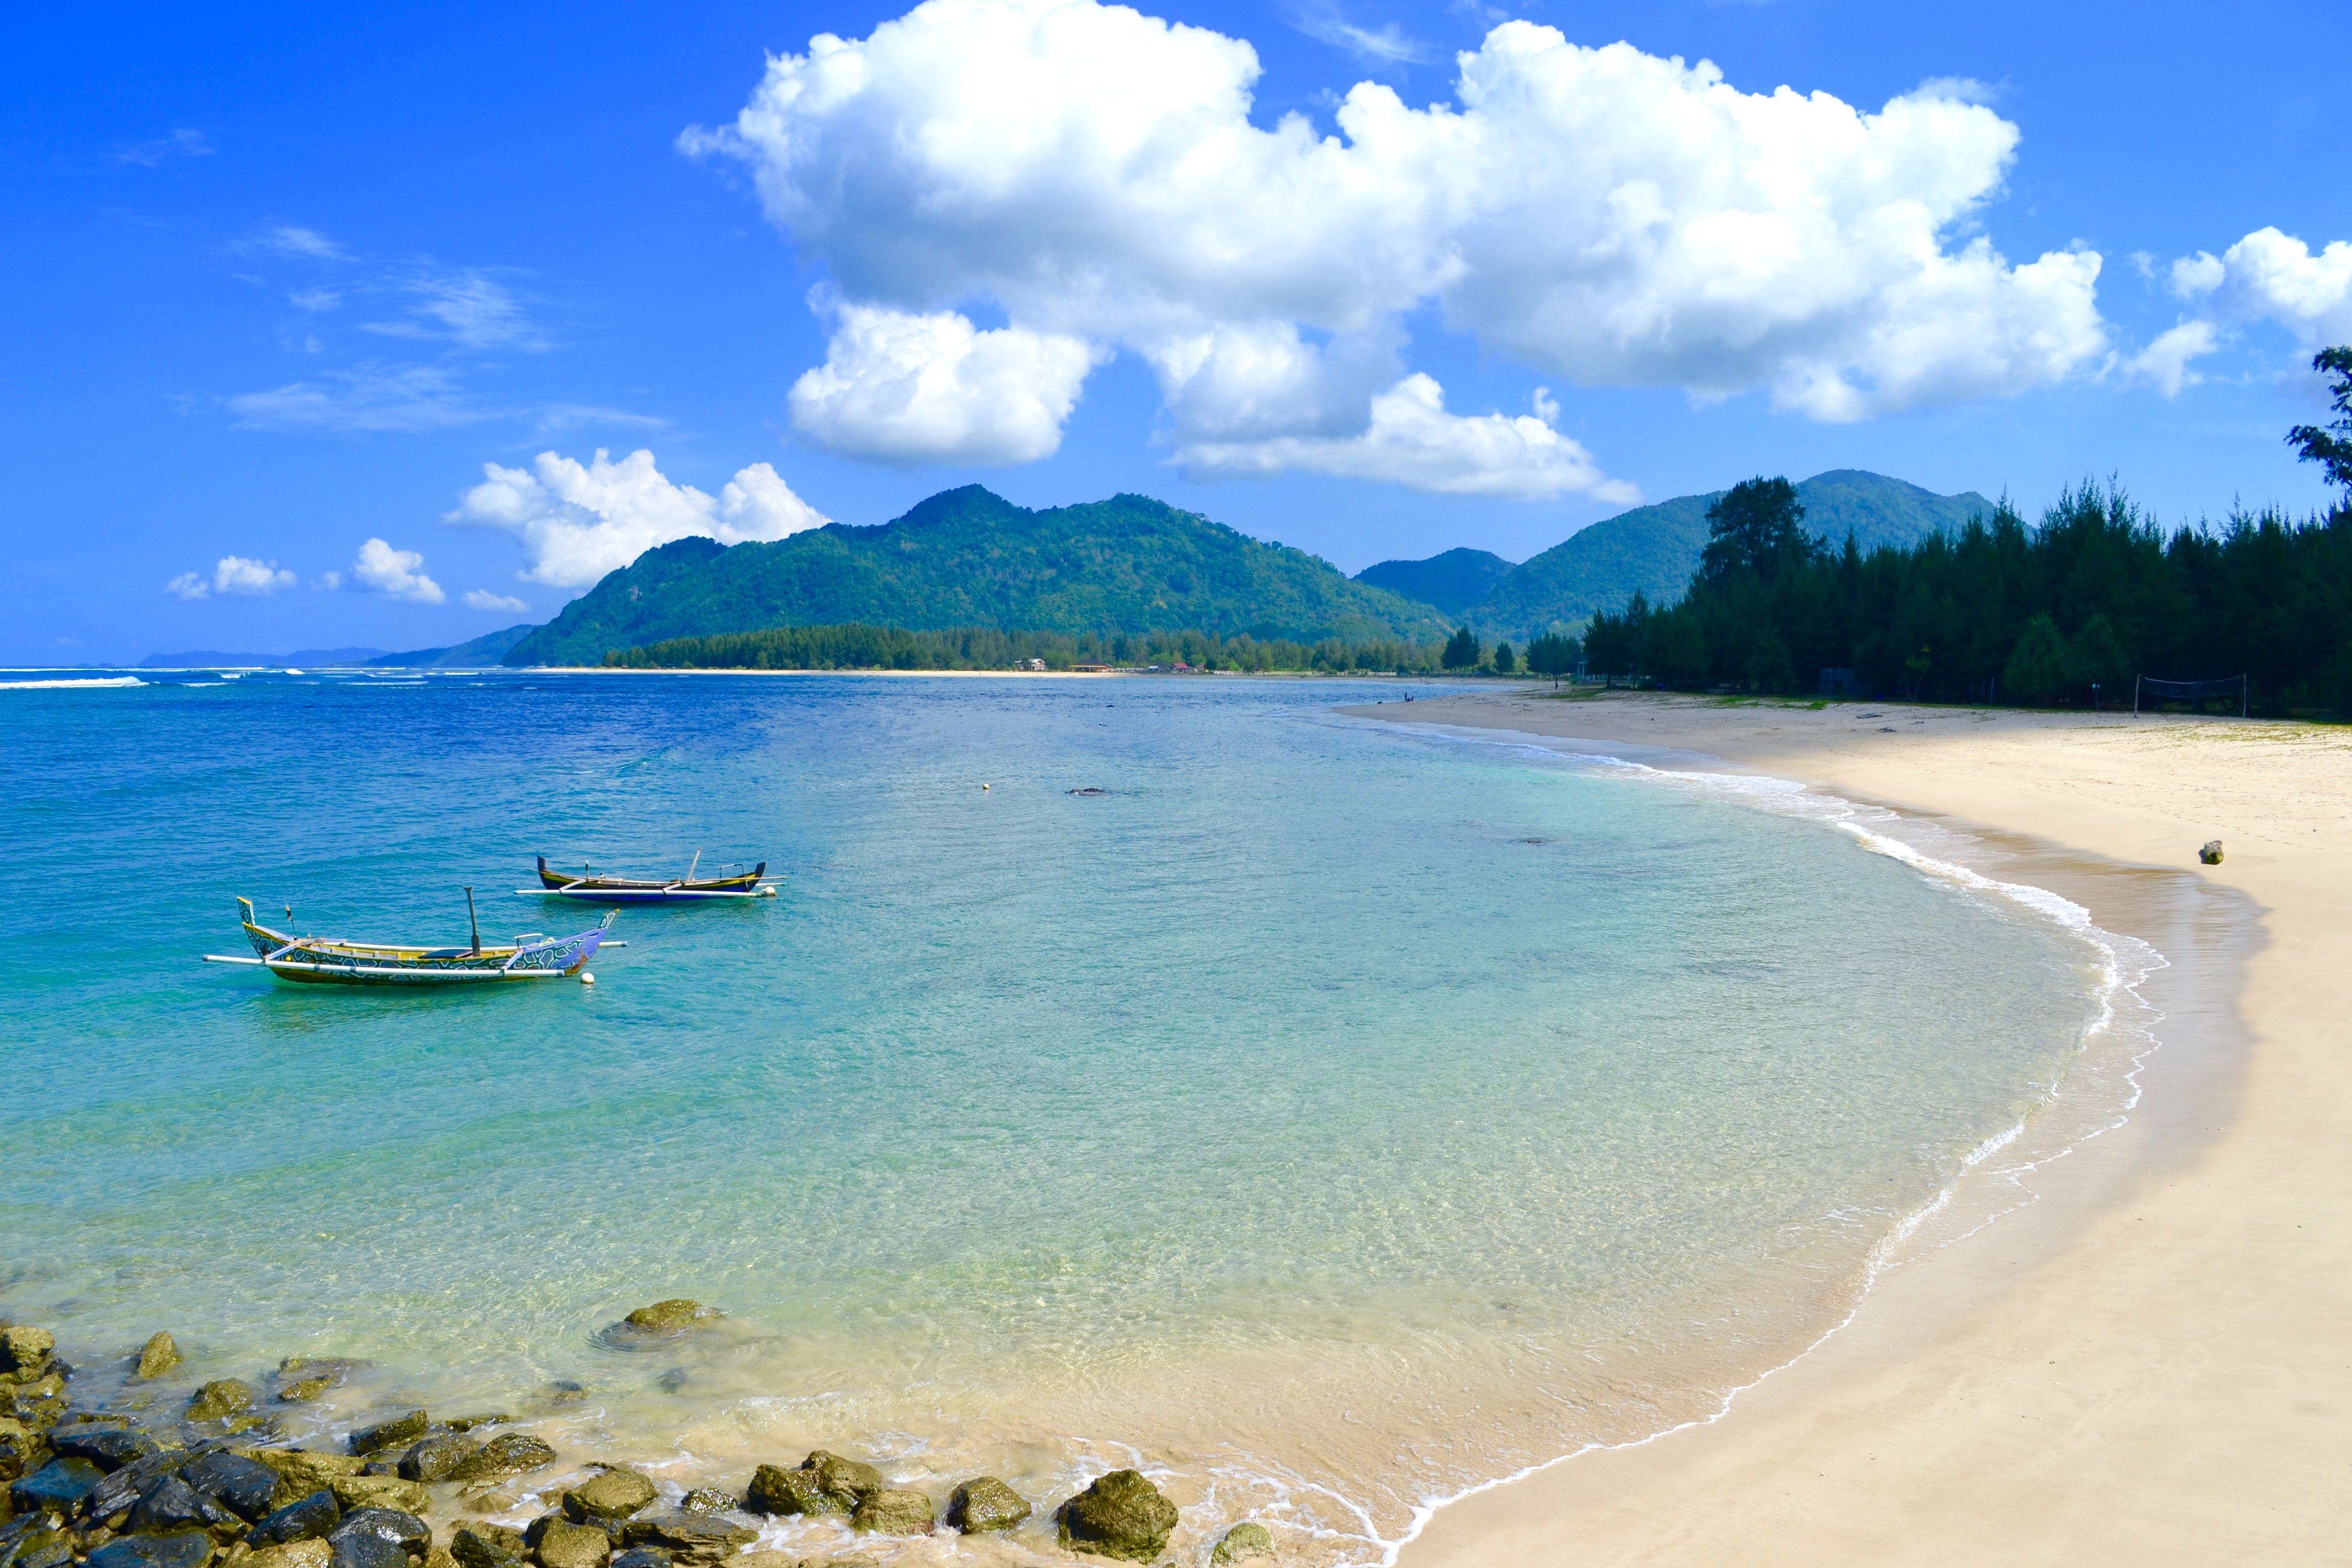 Hotels Near The Beach In Langkawi